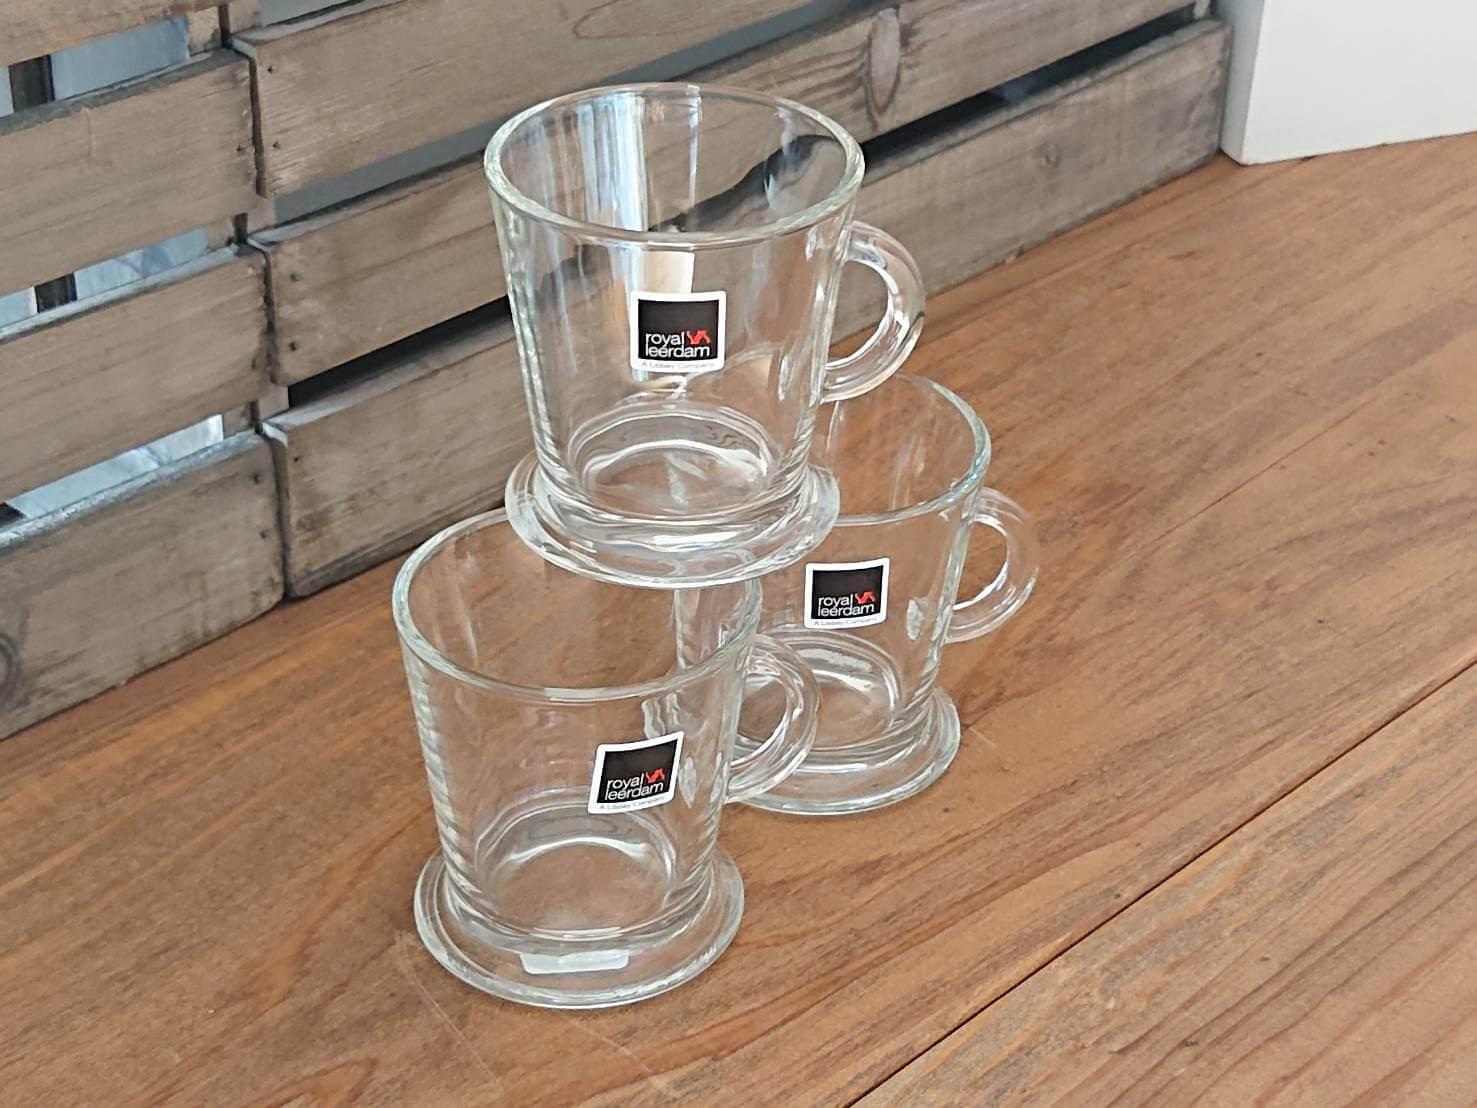 royal leerdam Glass Mini Mug cup デザート用にもおすすめガラスミニマグカップ